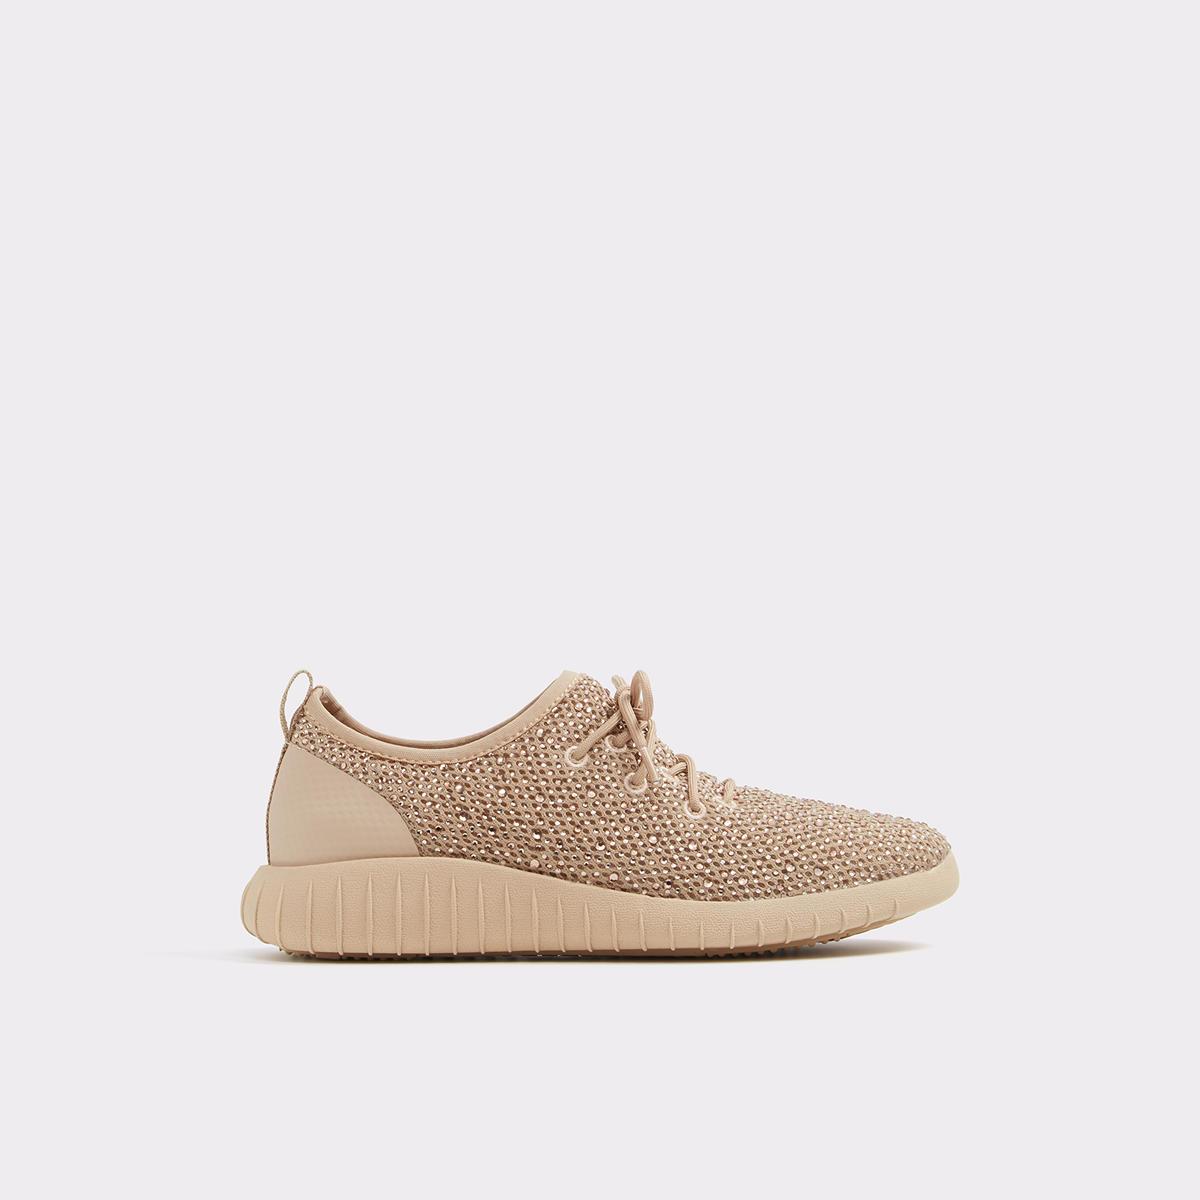 Swayze Bone Women's Sneakers | ALDO US at Aldo Shoes in Victor, NY | Tuggl